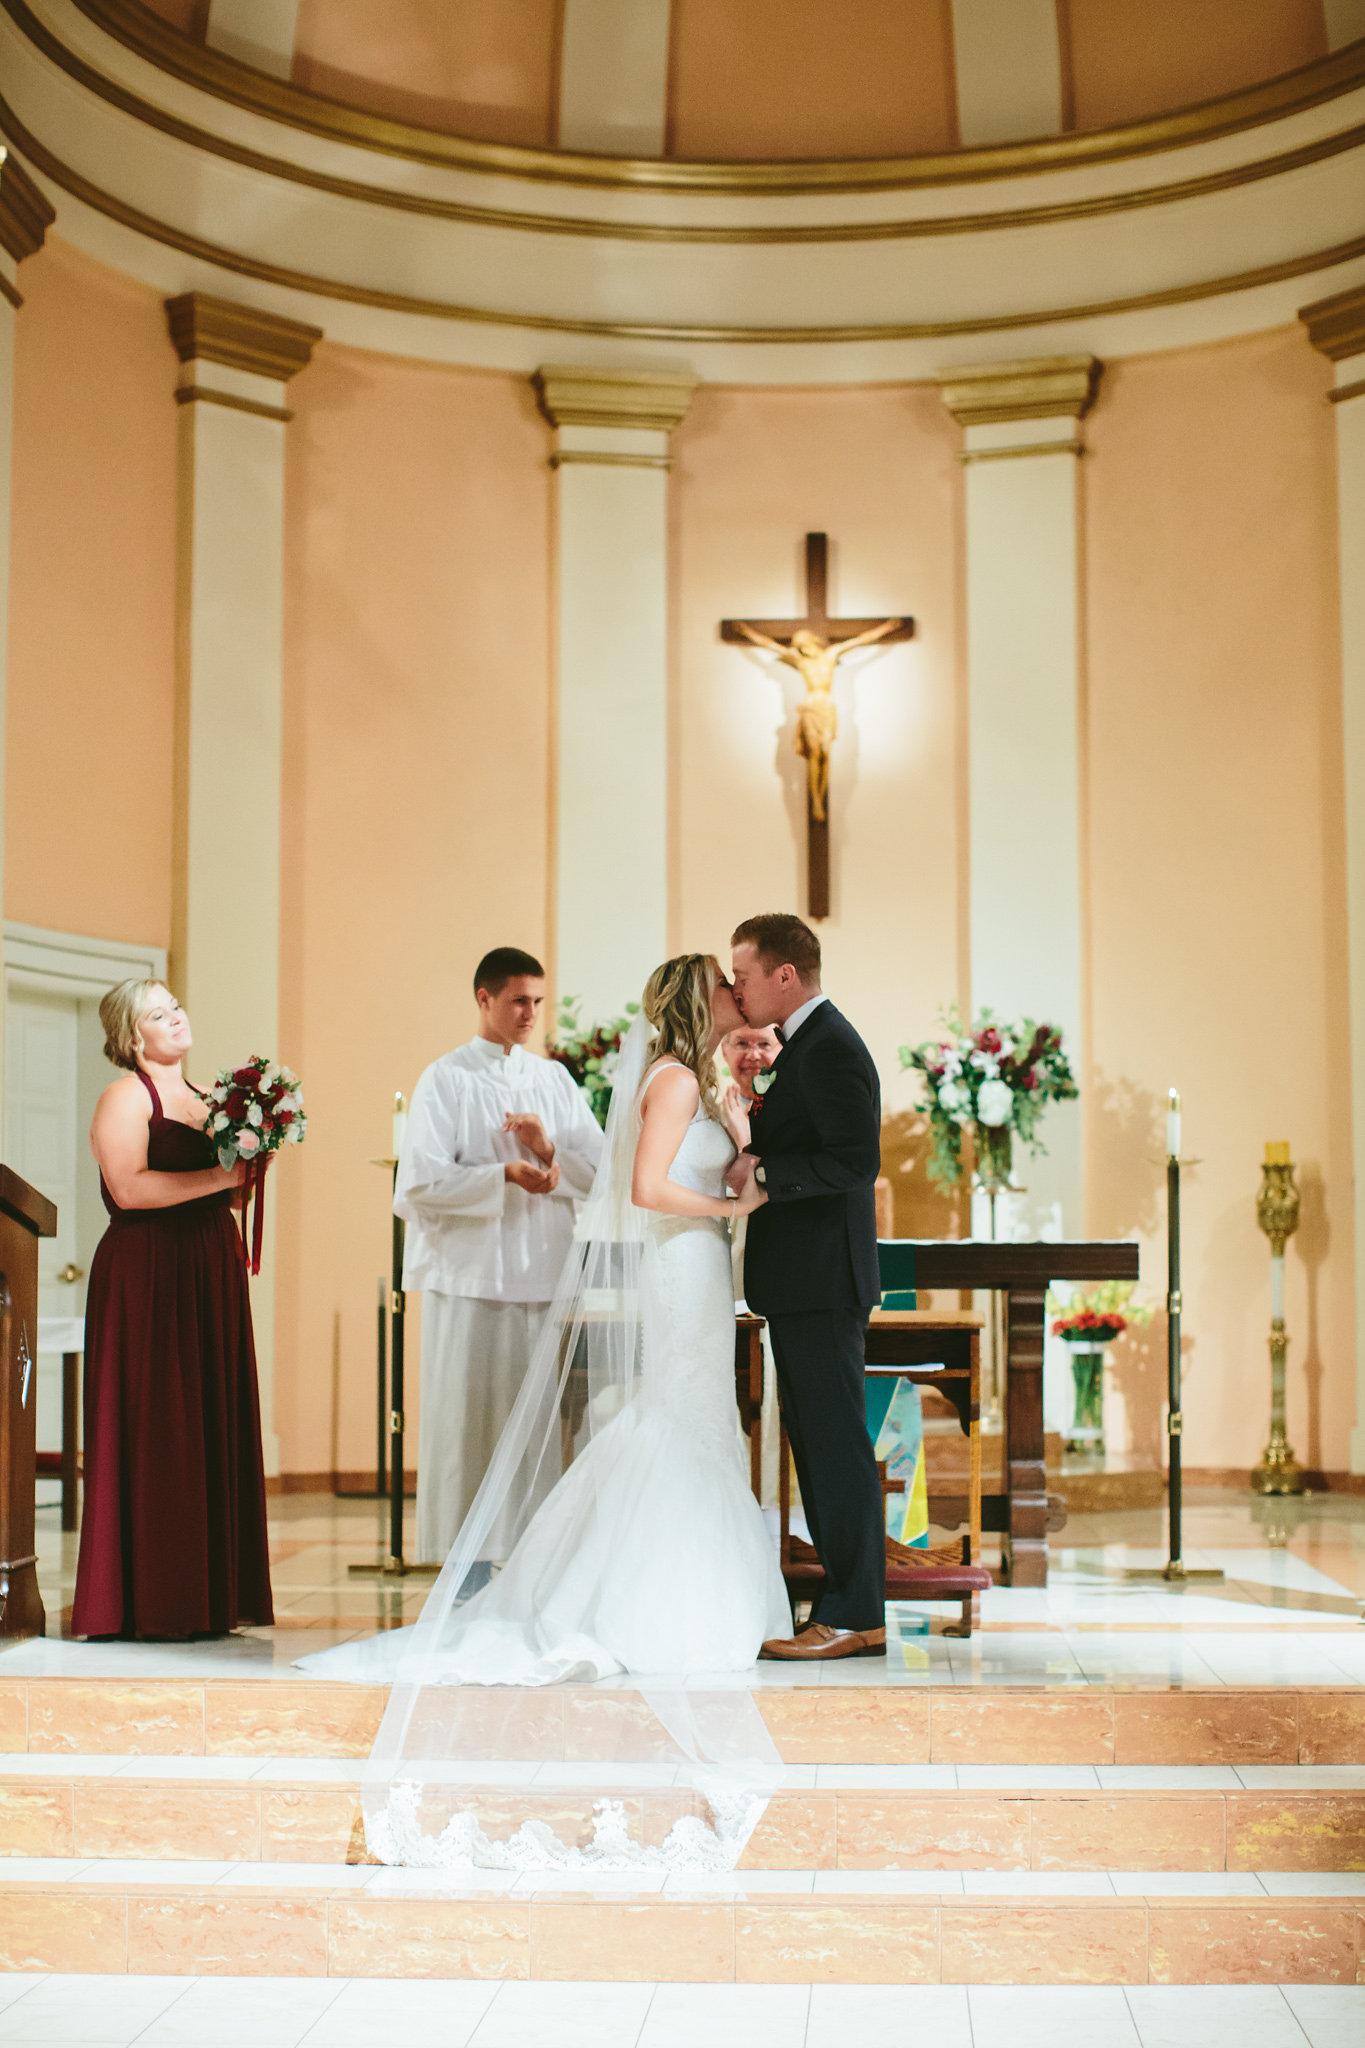 Kristen+Nick-WEDDING_WEB-379.jpg